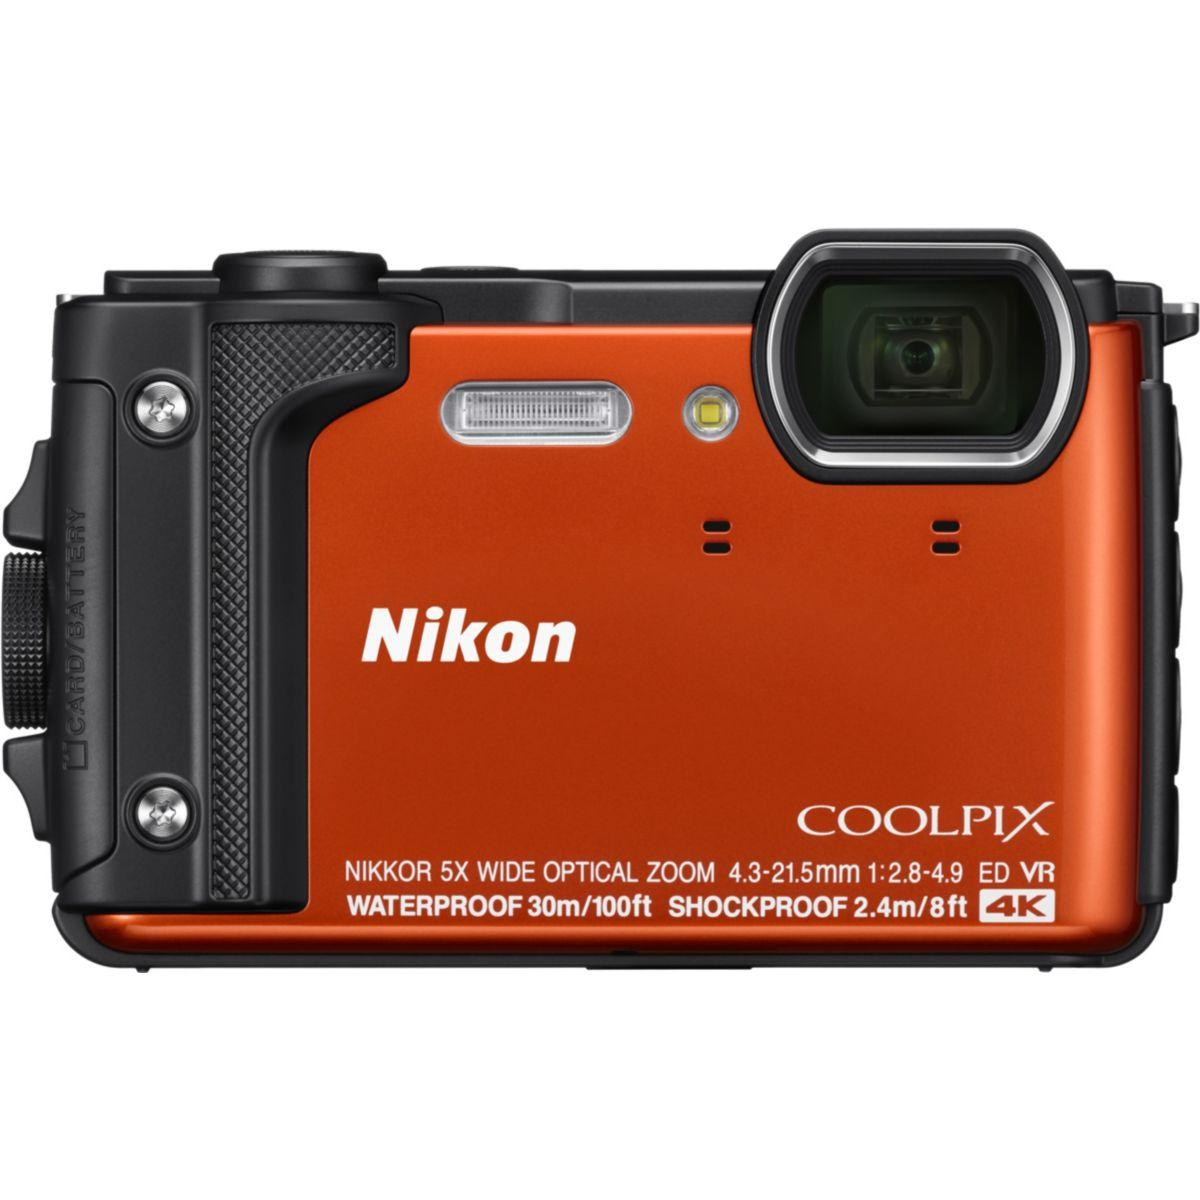 Appareil photo compact nikon coolpix w300 orange + sac �tanche (photo)